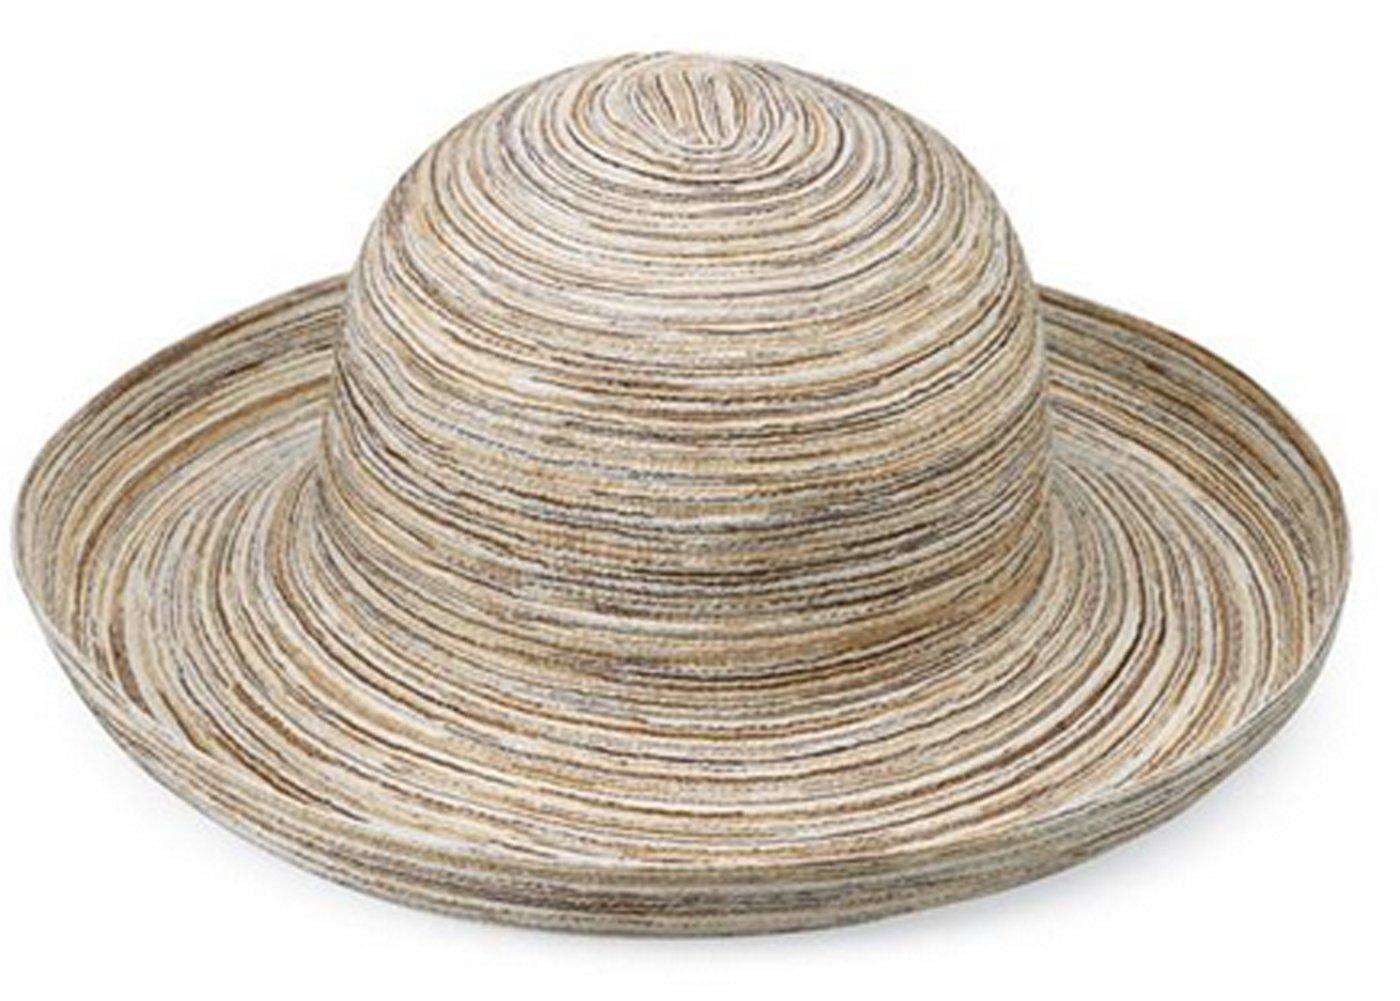 Best Rated in Women s Sun Hats   Helpful Customer Reviews - Amazon.com 88f343501dd